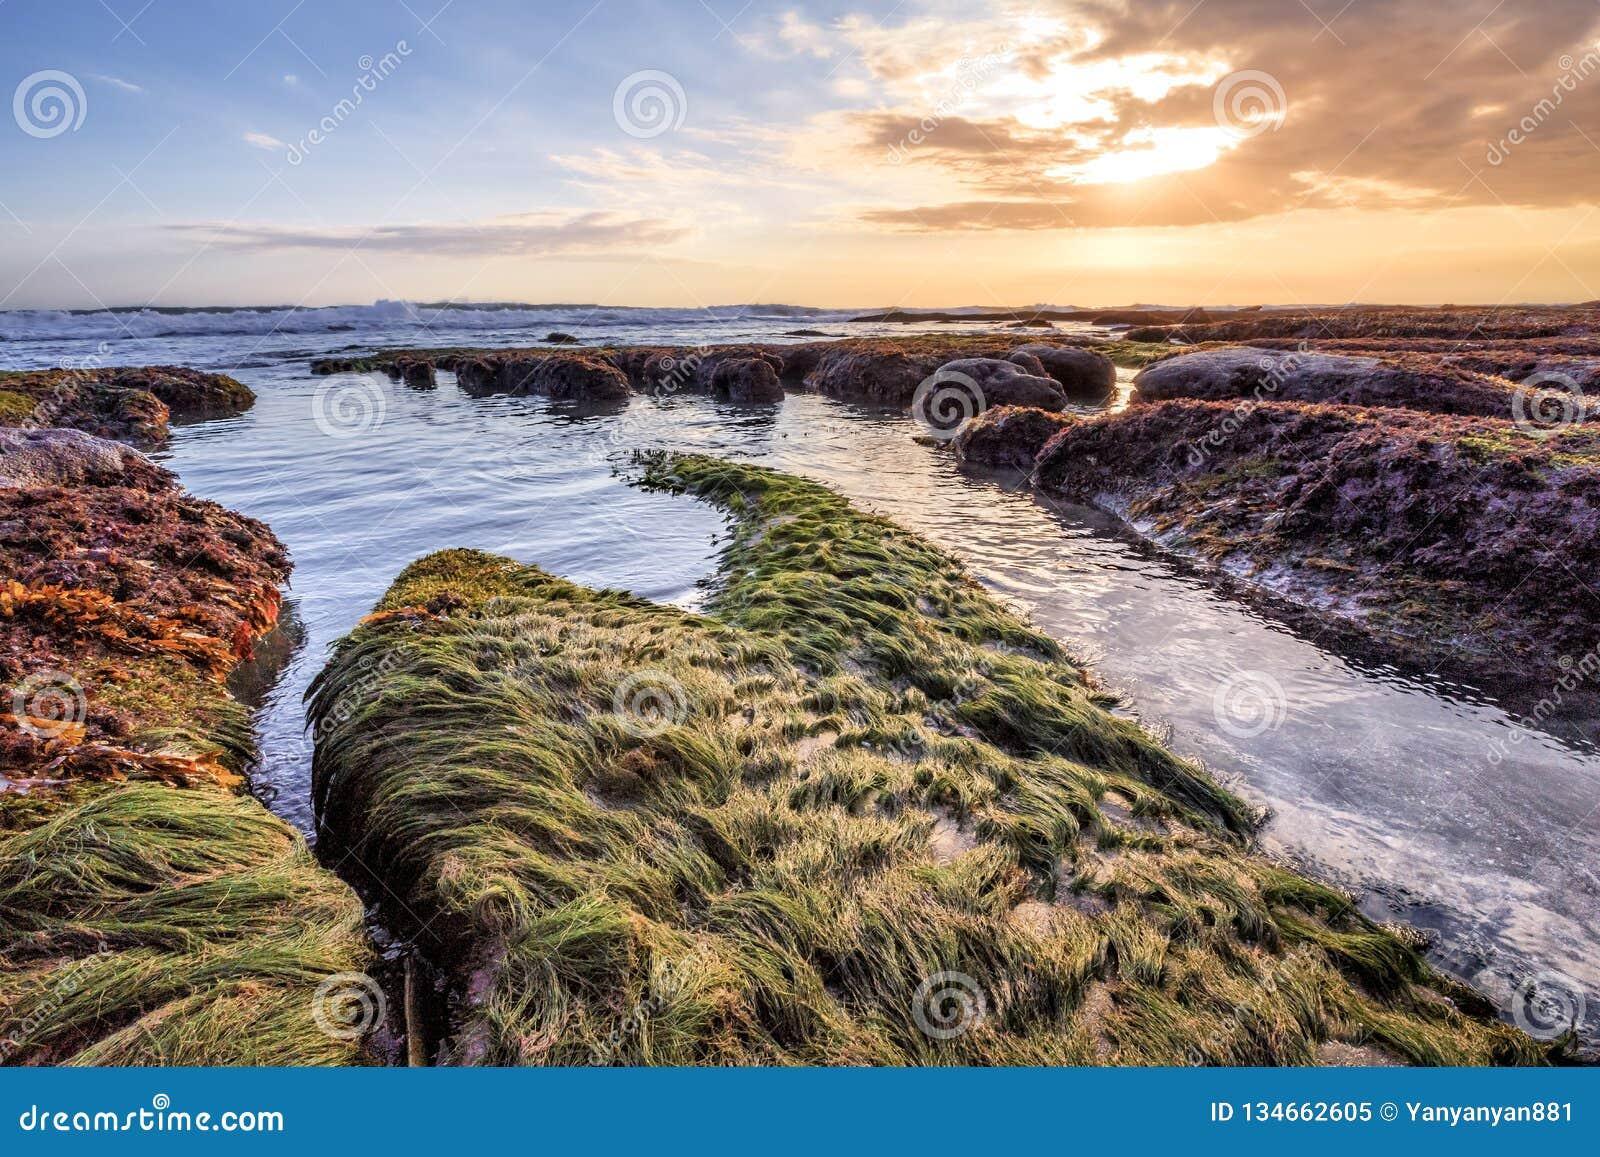 Scenisk kustlinje av havsgräs i Bali Indonesien